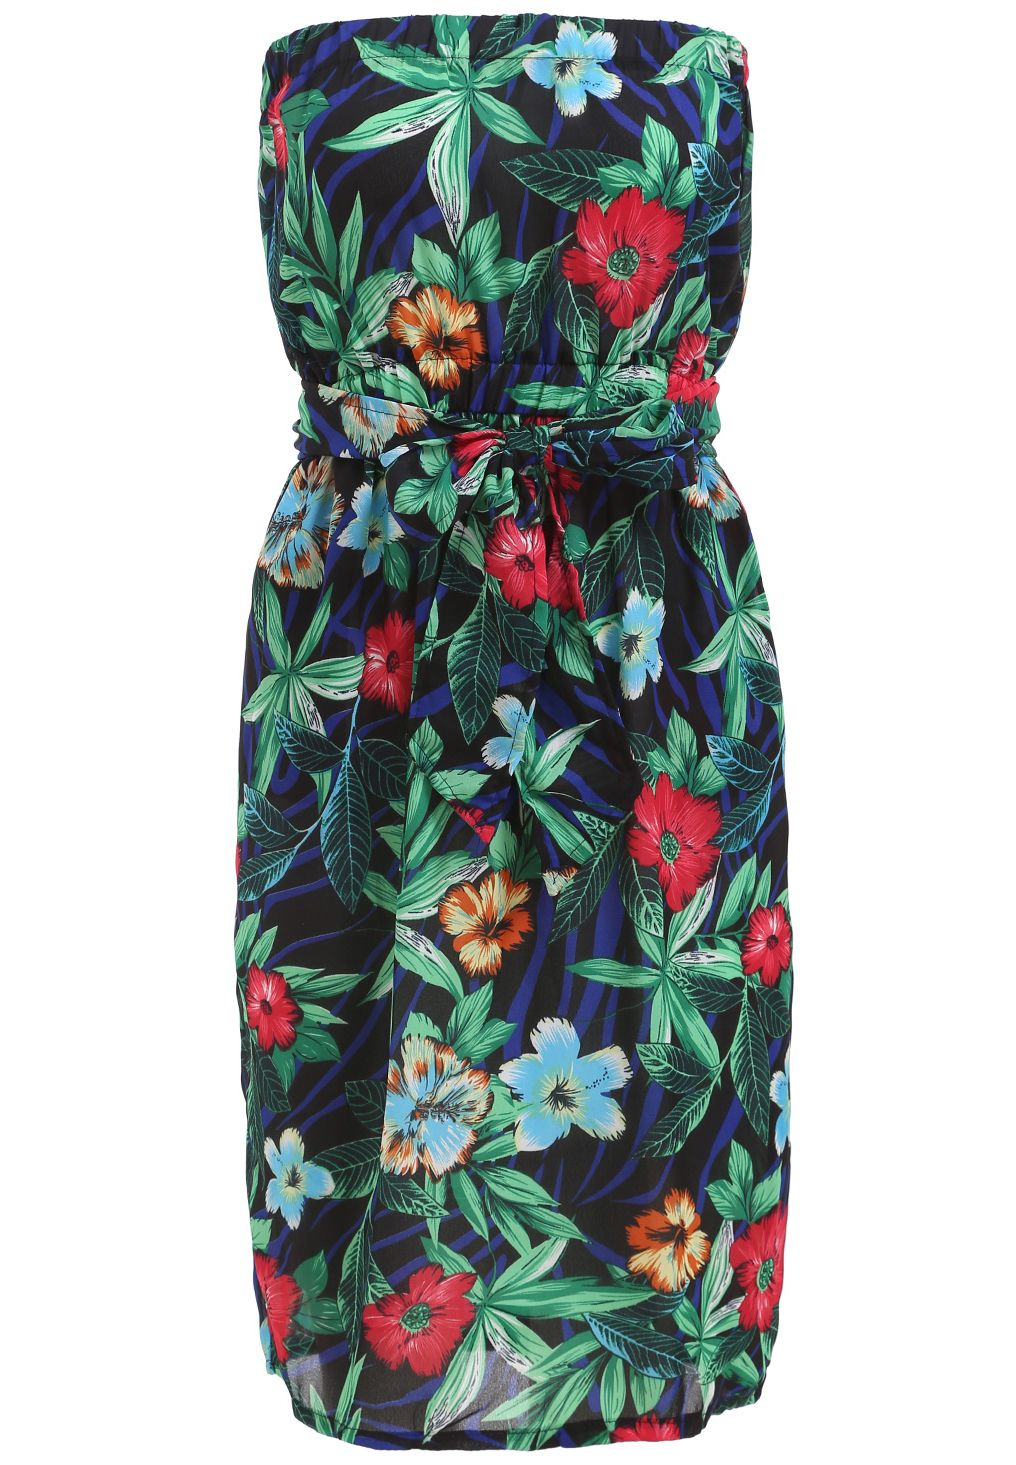 Navy Strapless Floral Belt Chiffon Dress 17.00